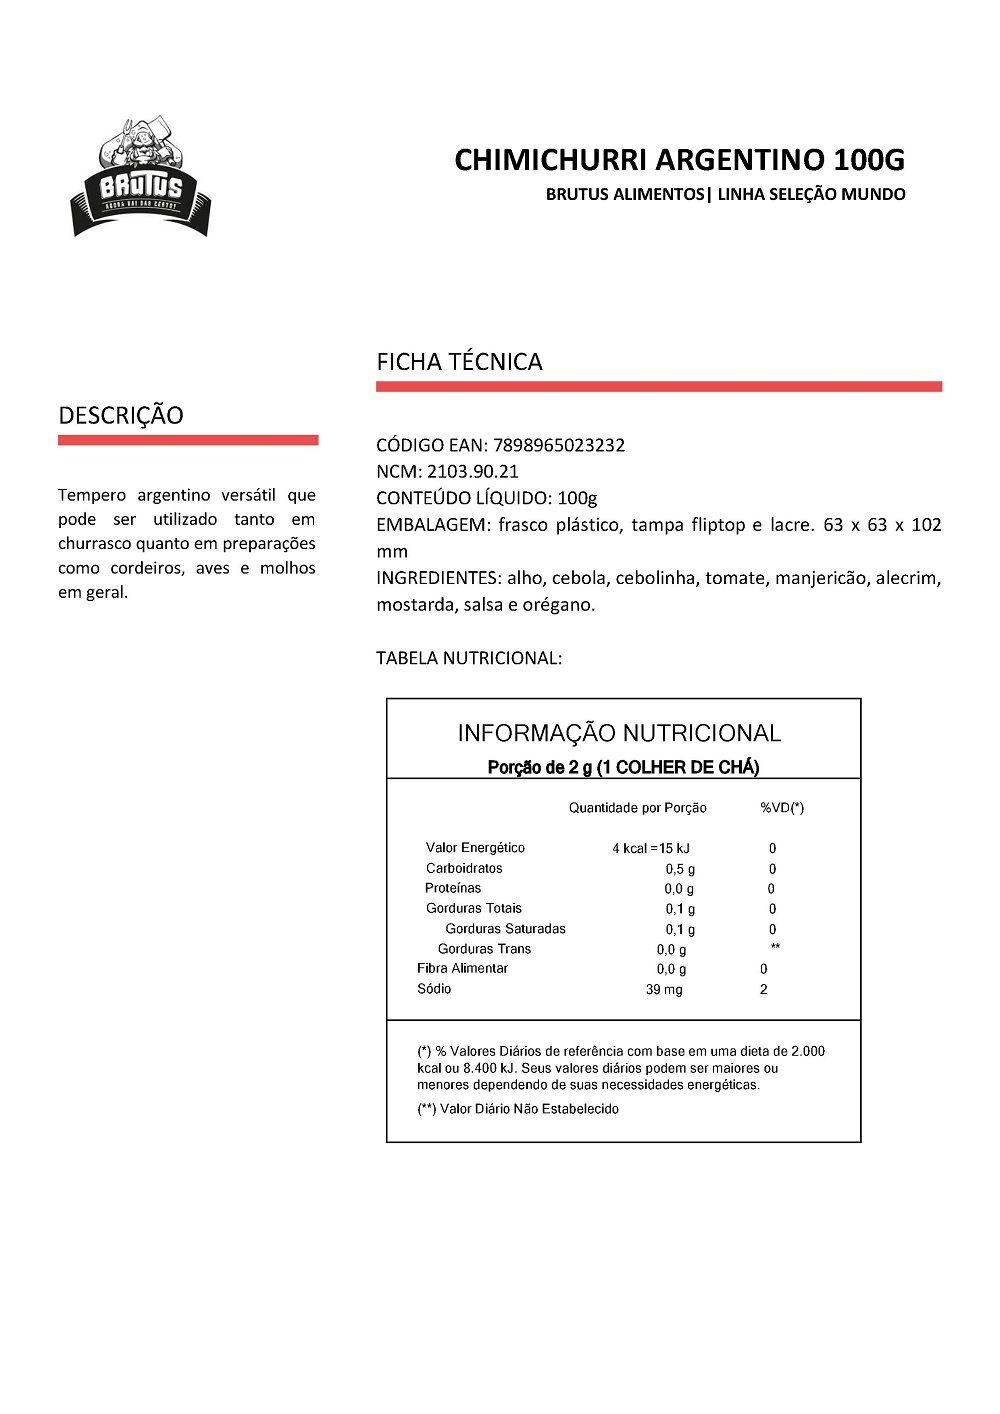 Chimichurri Argentino Tempera Molhos Churrascos Brutus 100g